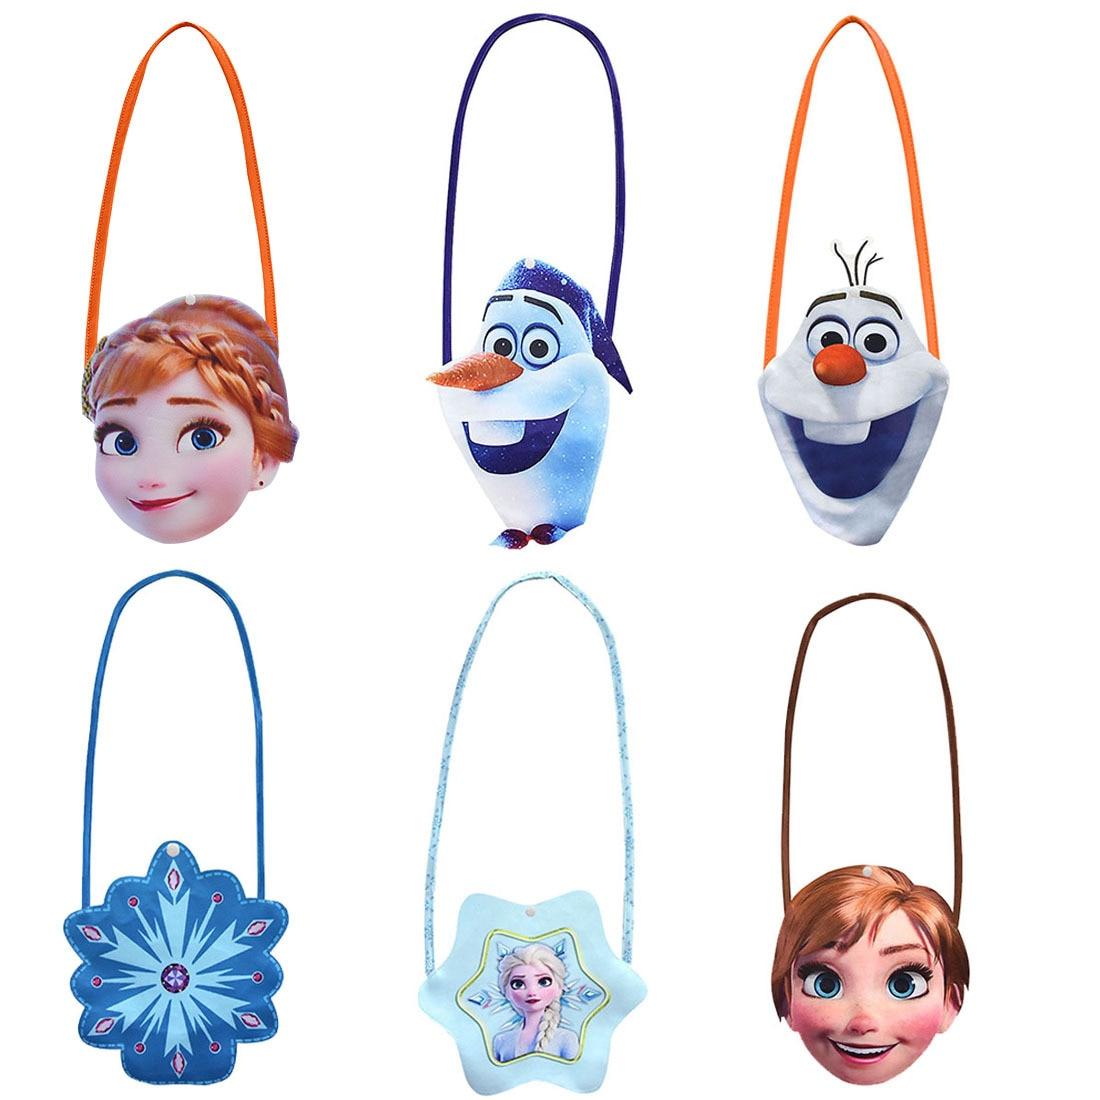 Disney Shoulder Bags Girl Frozen Crossbody Bags 3D Cartoon Messenger Bag Mini Cute Travel Bags Small Wallet Weekend Bag